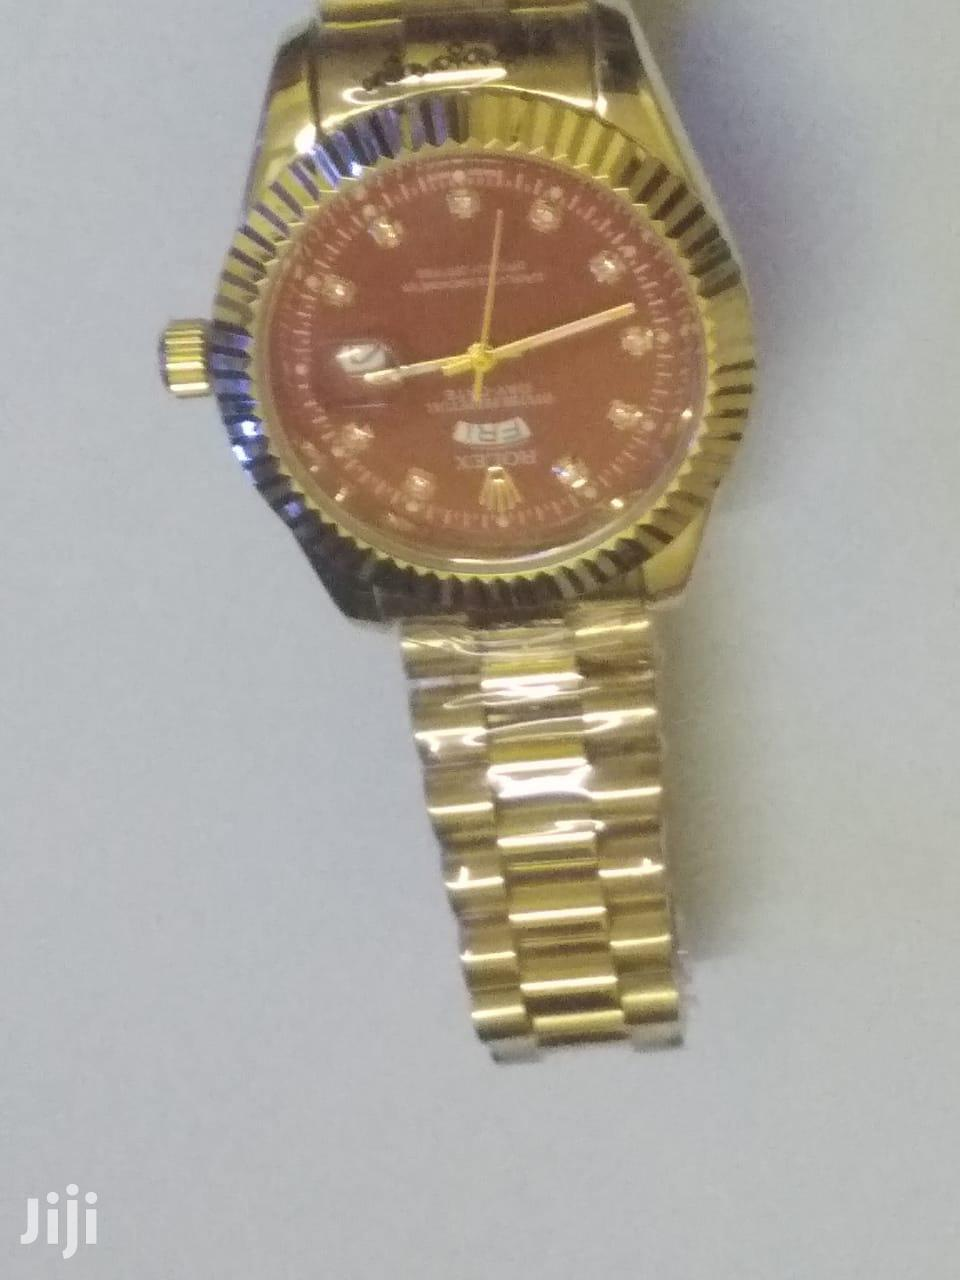 Rolex Red Diamond Fashionable Watch   Watches for sale in Nairobi Central, Nairobi, Kenya